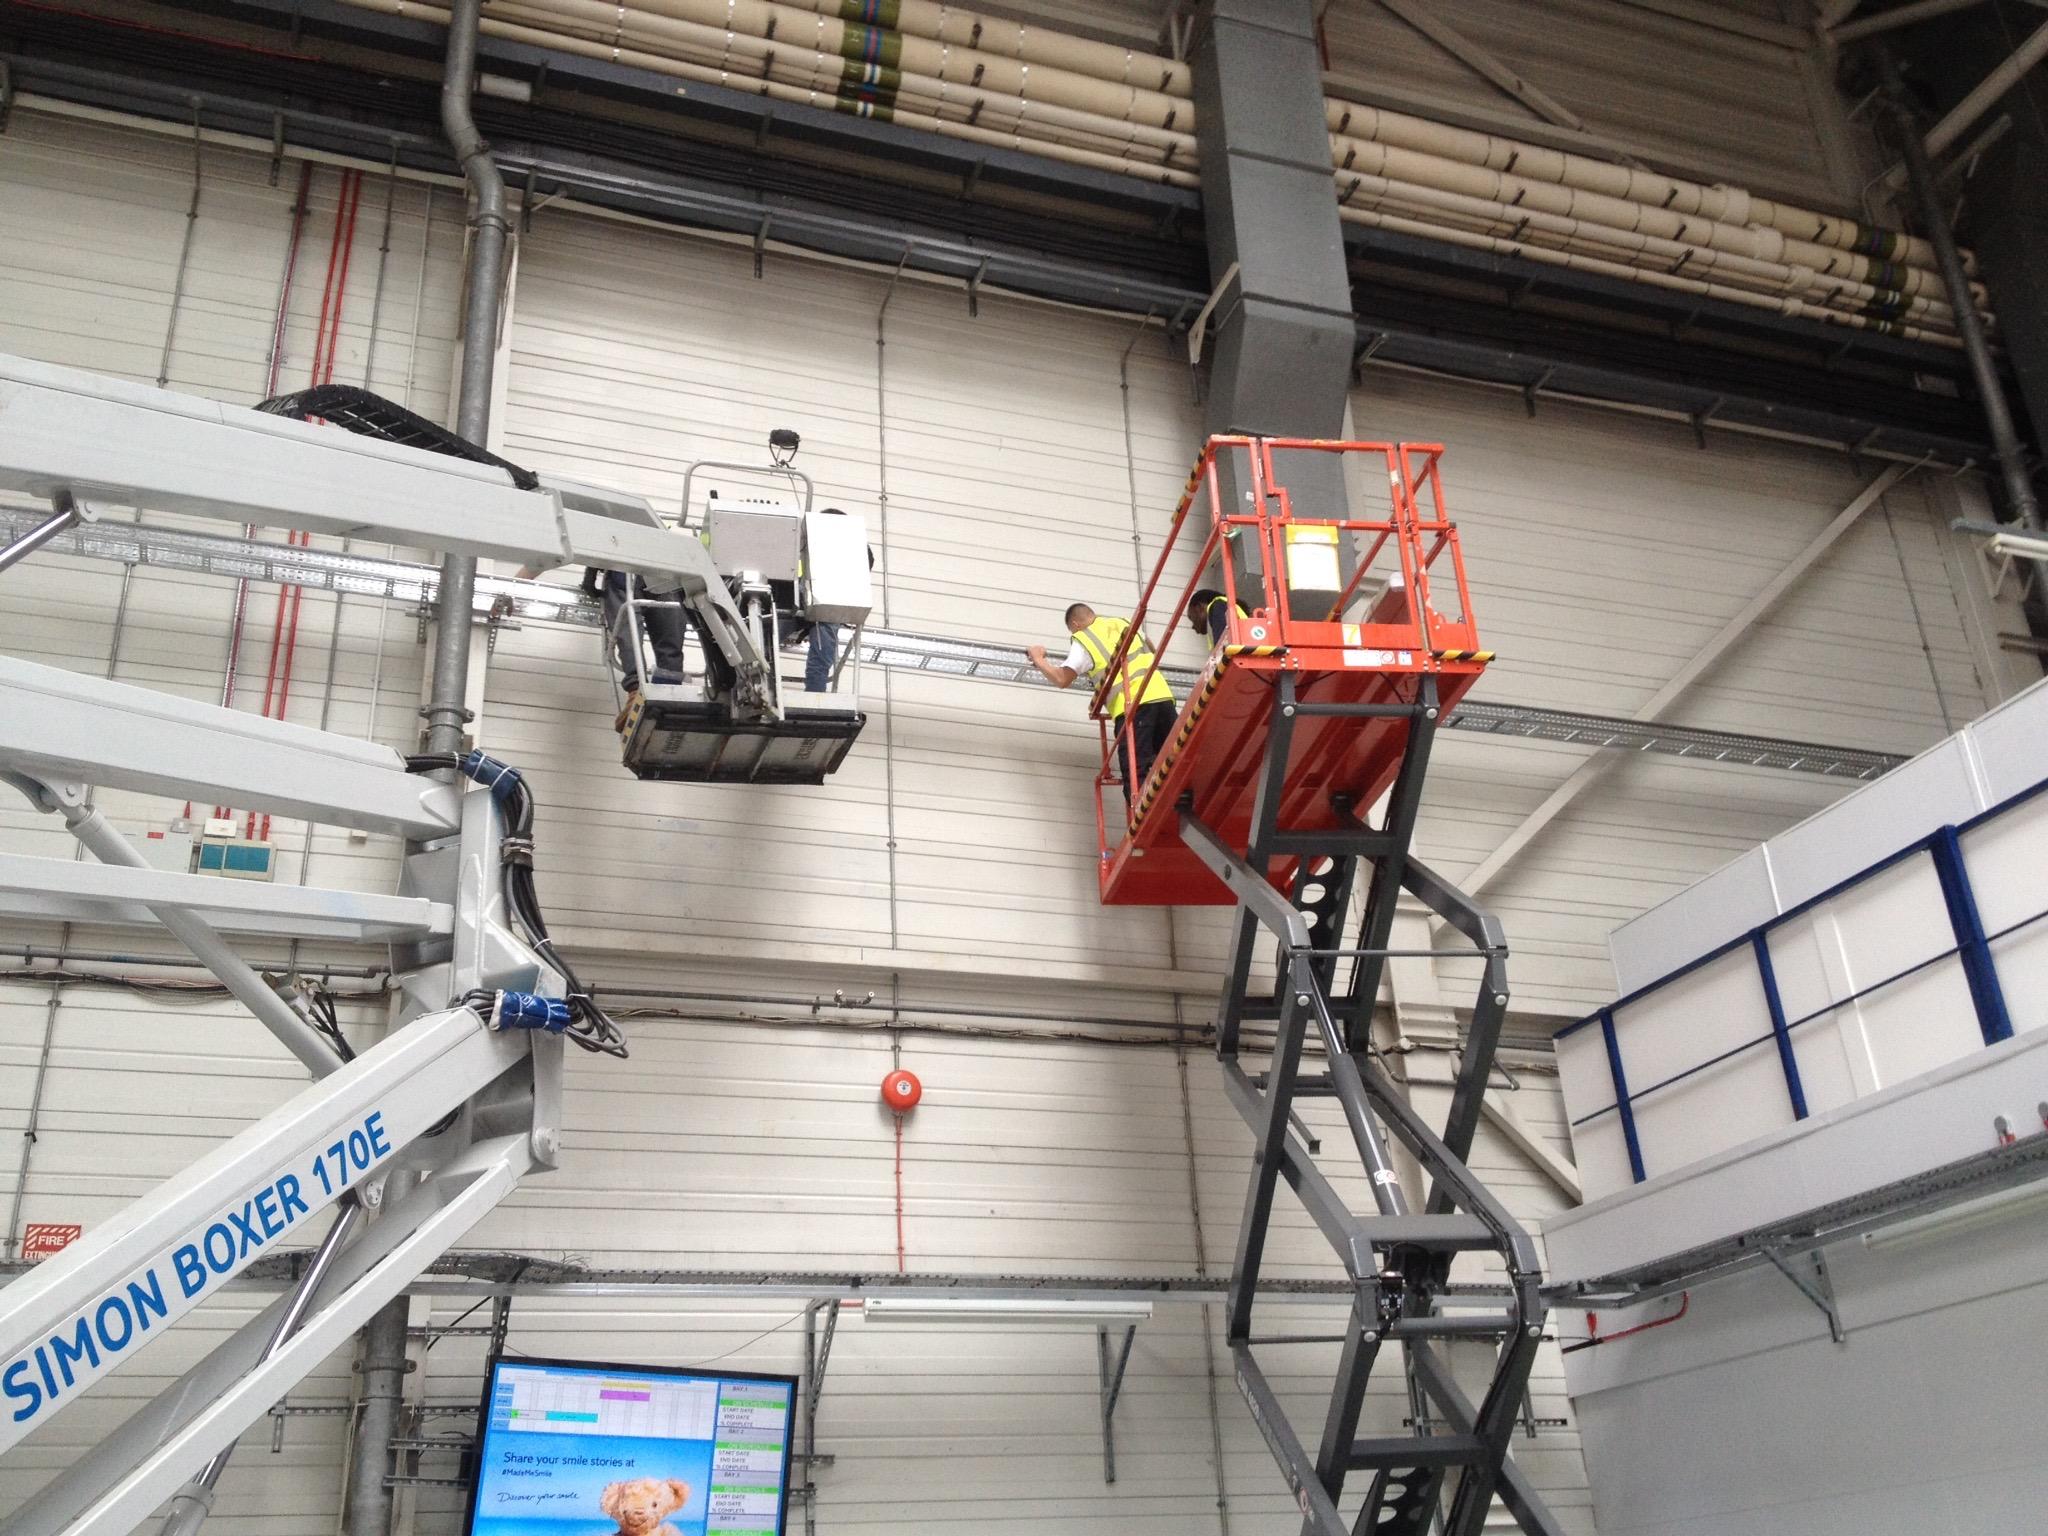 Laddre racking from genie lift.jpg